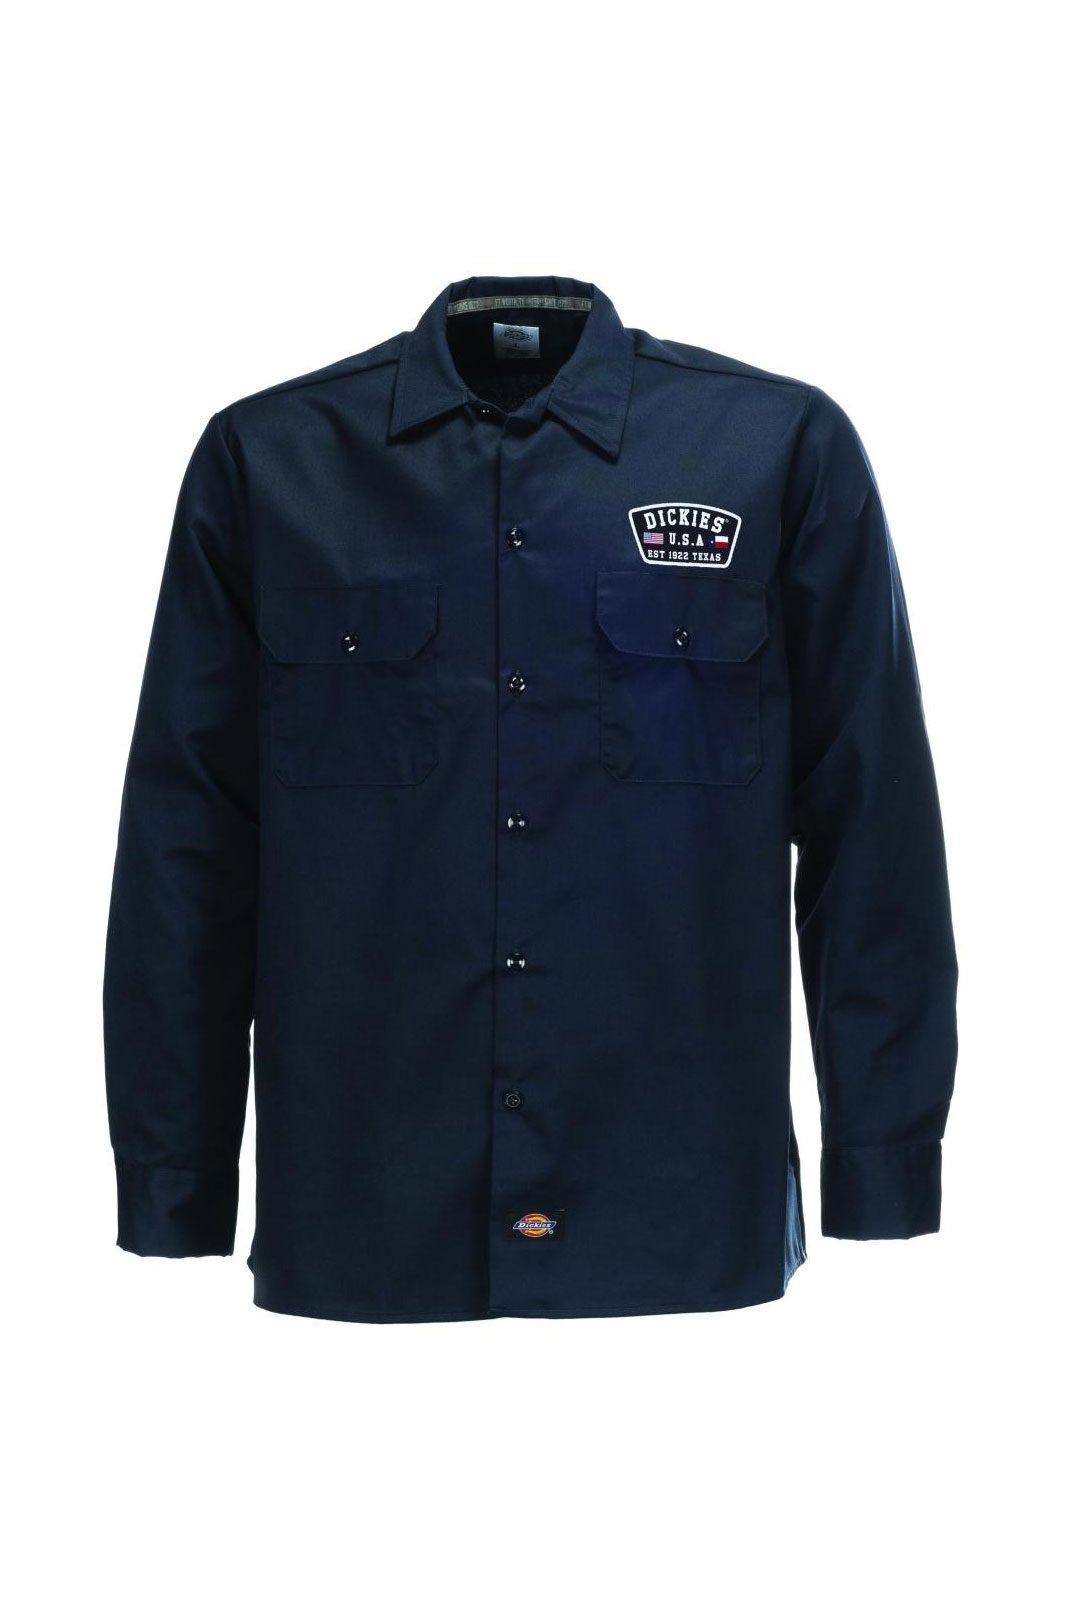 Minersville Shirt Navy